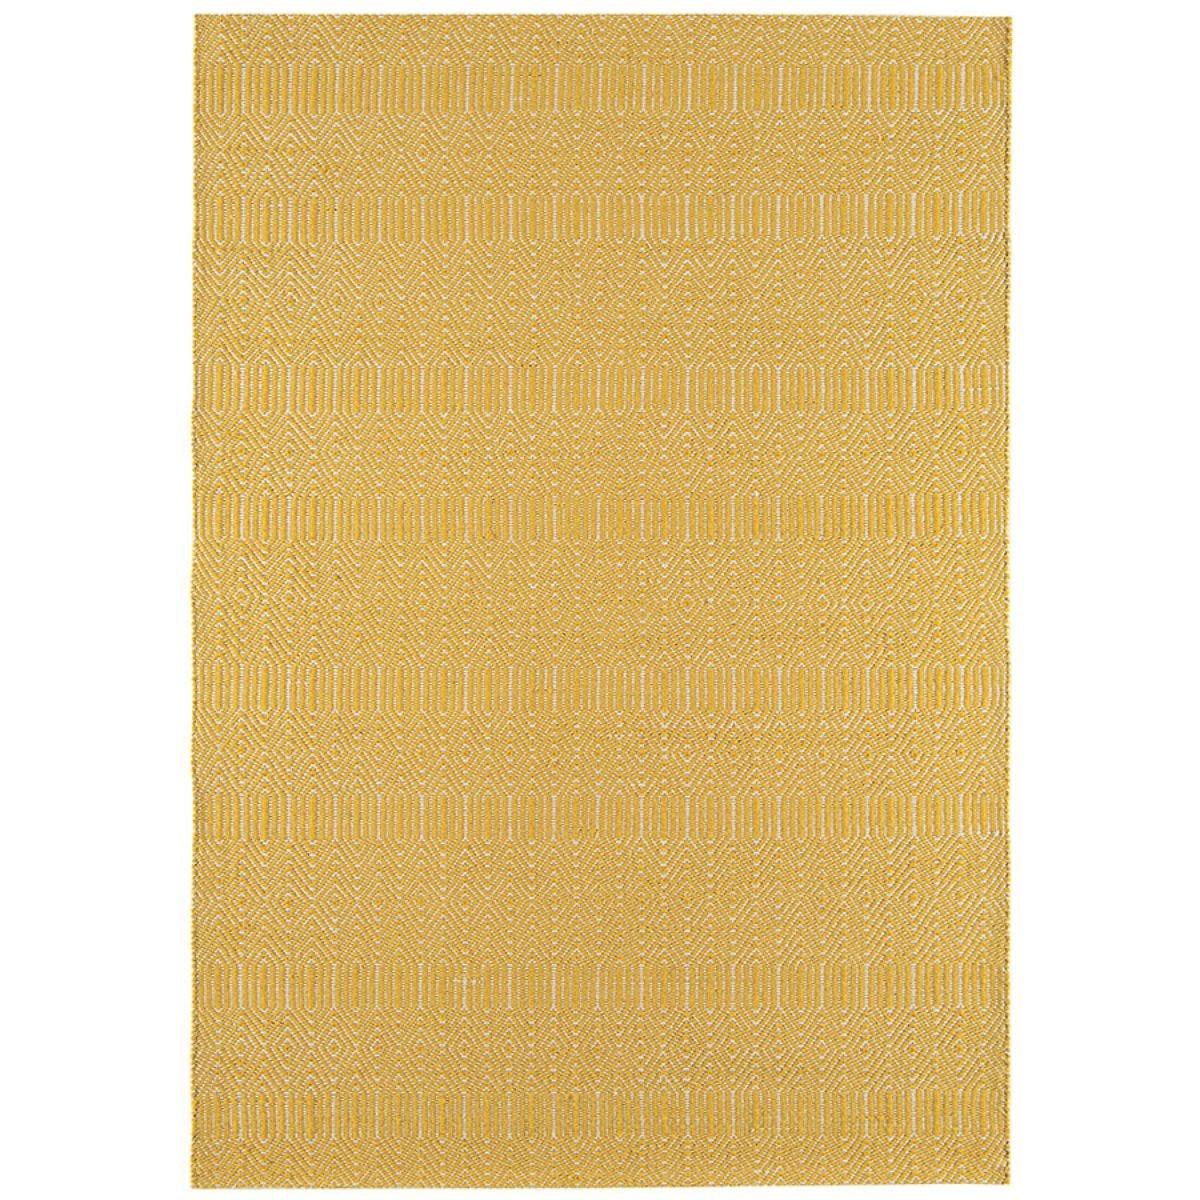 Asiatic Sloan Rug, 120 x 170cm - Mustard